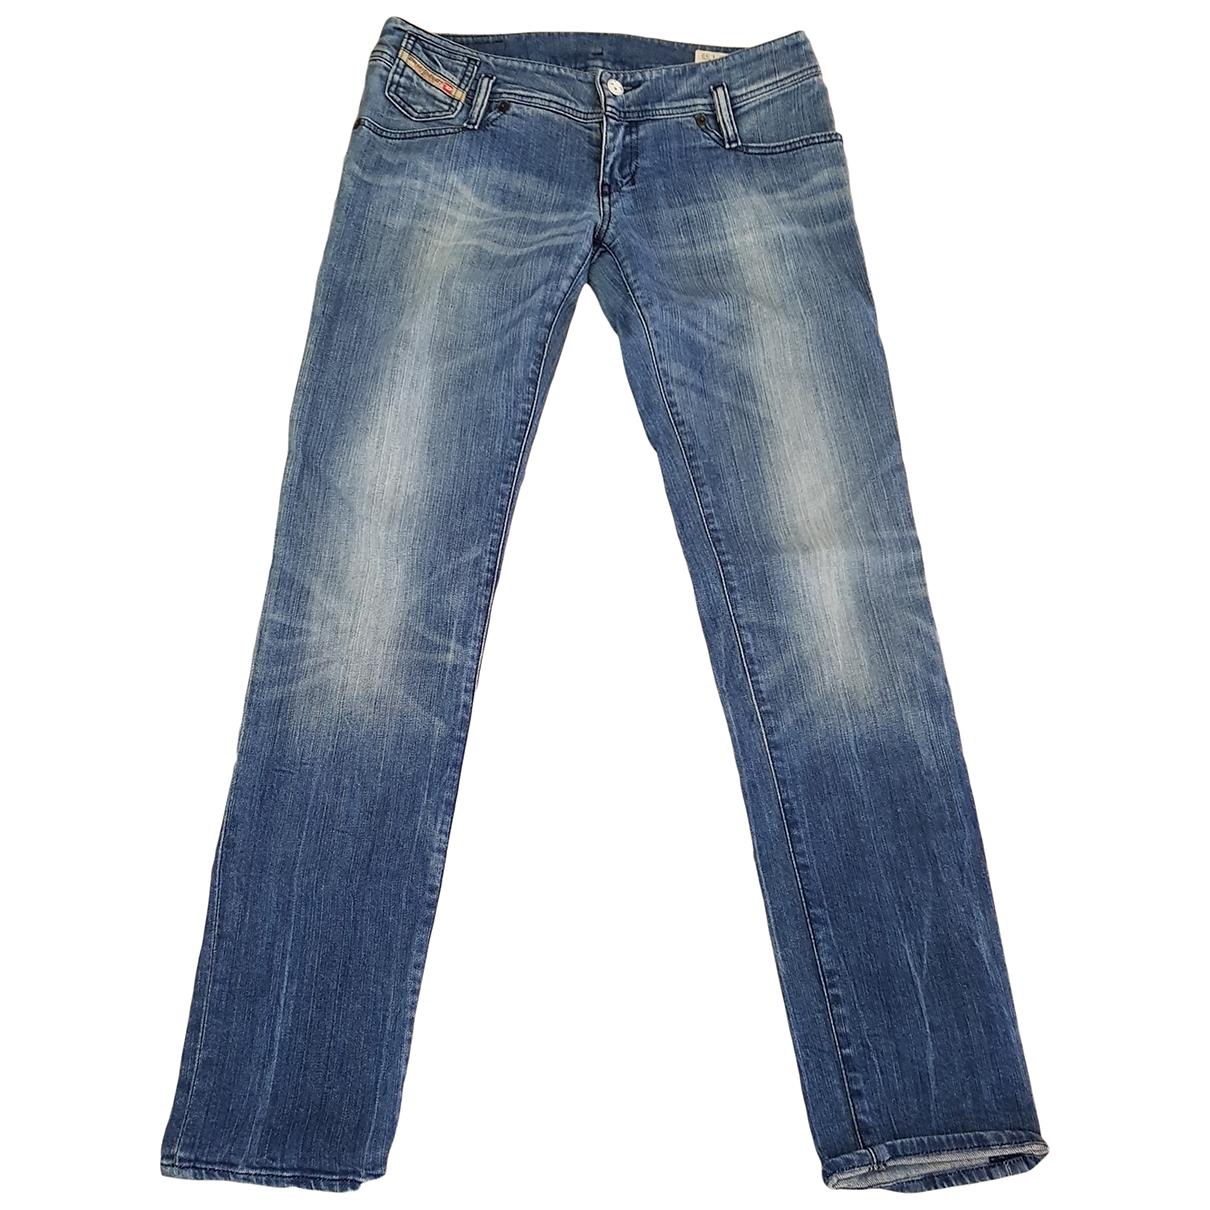 Diesel \N Cotton - elasthane Jeans for Women 28 US